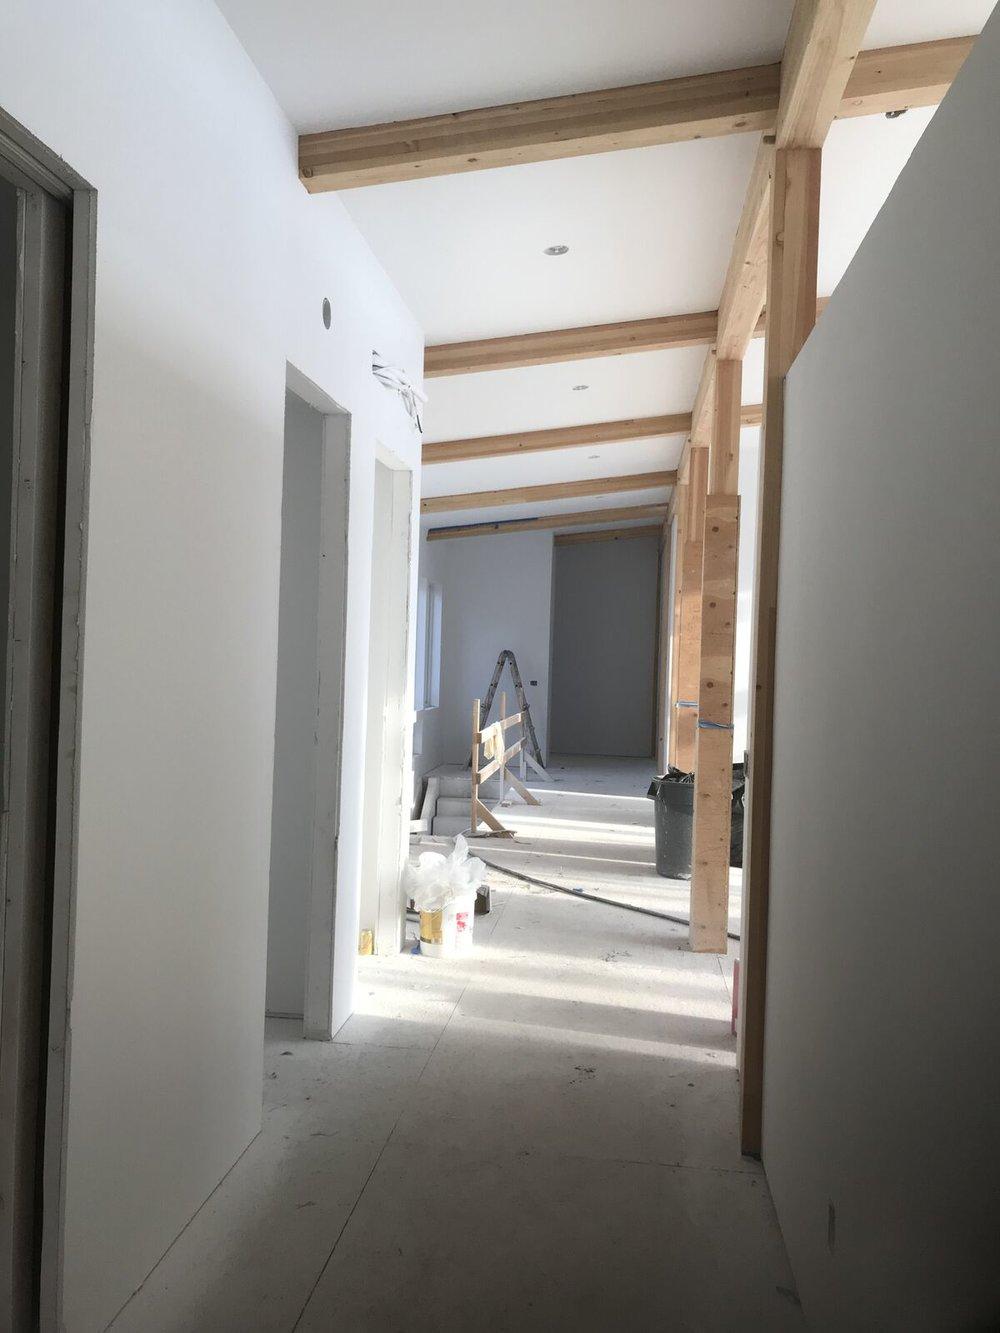 28 interior hall.jpeg